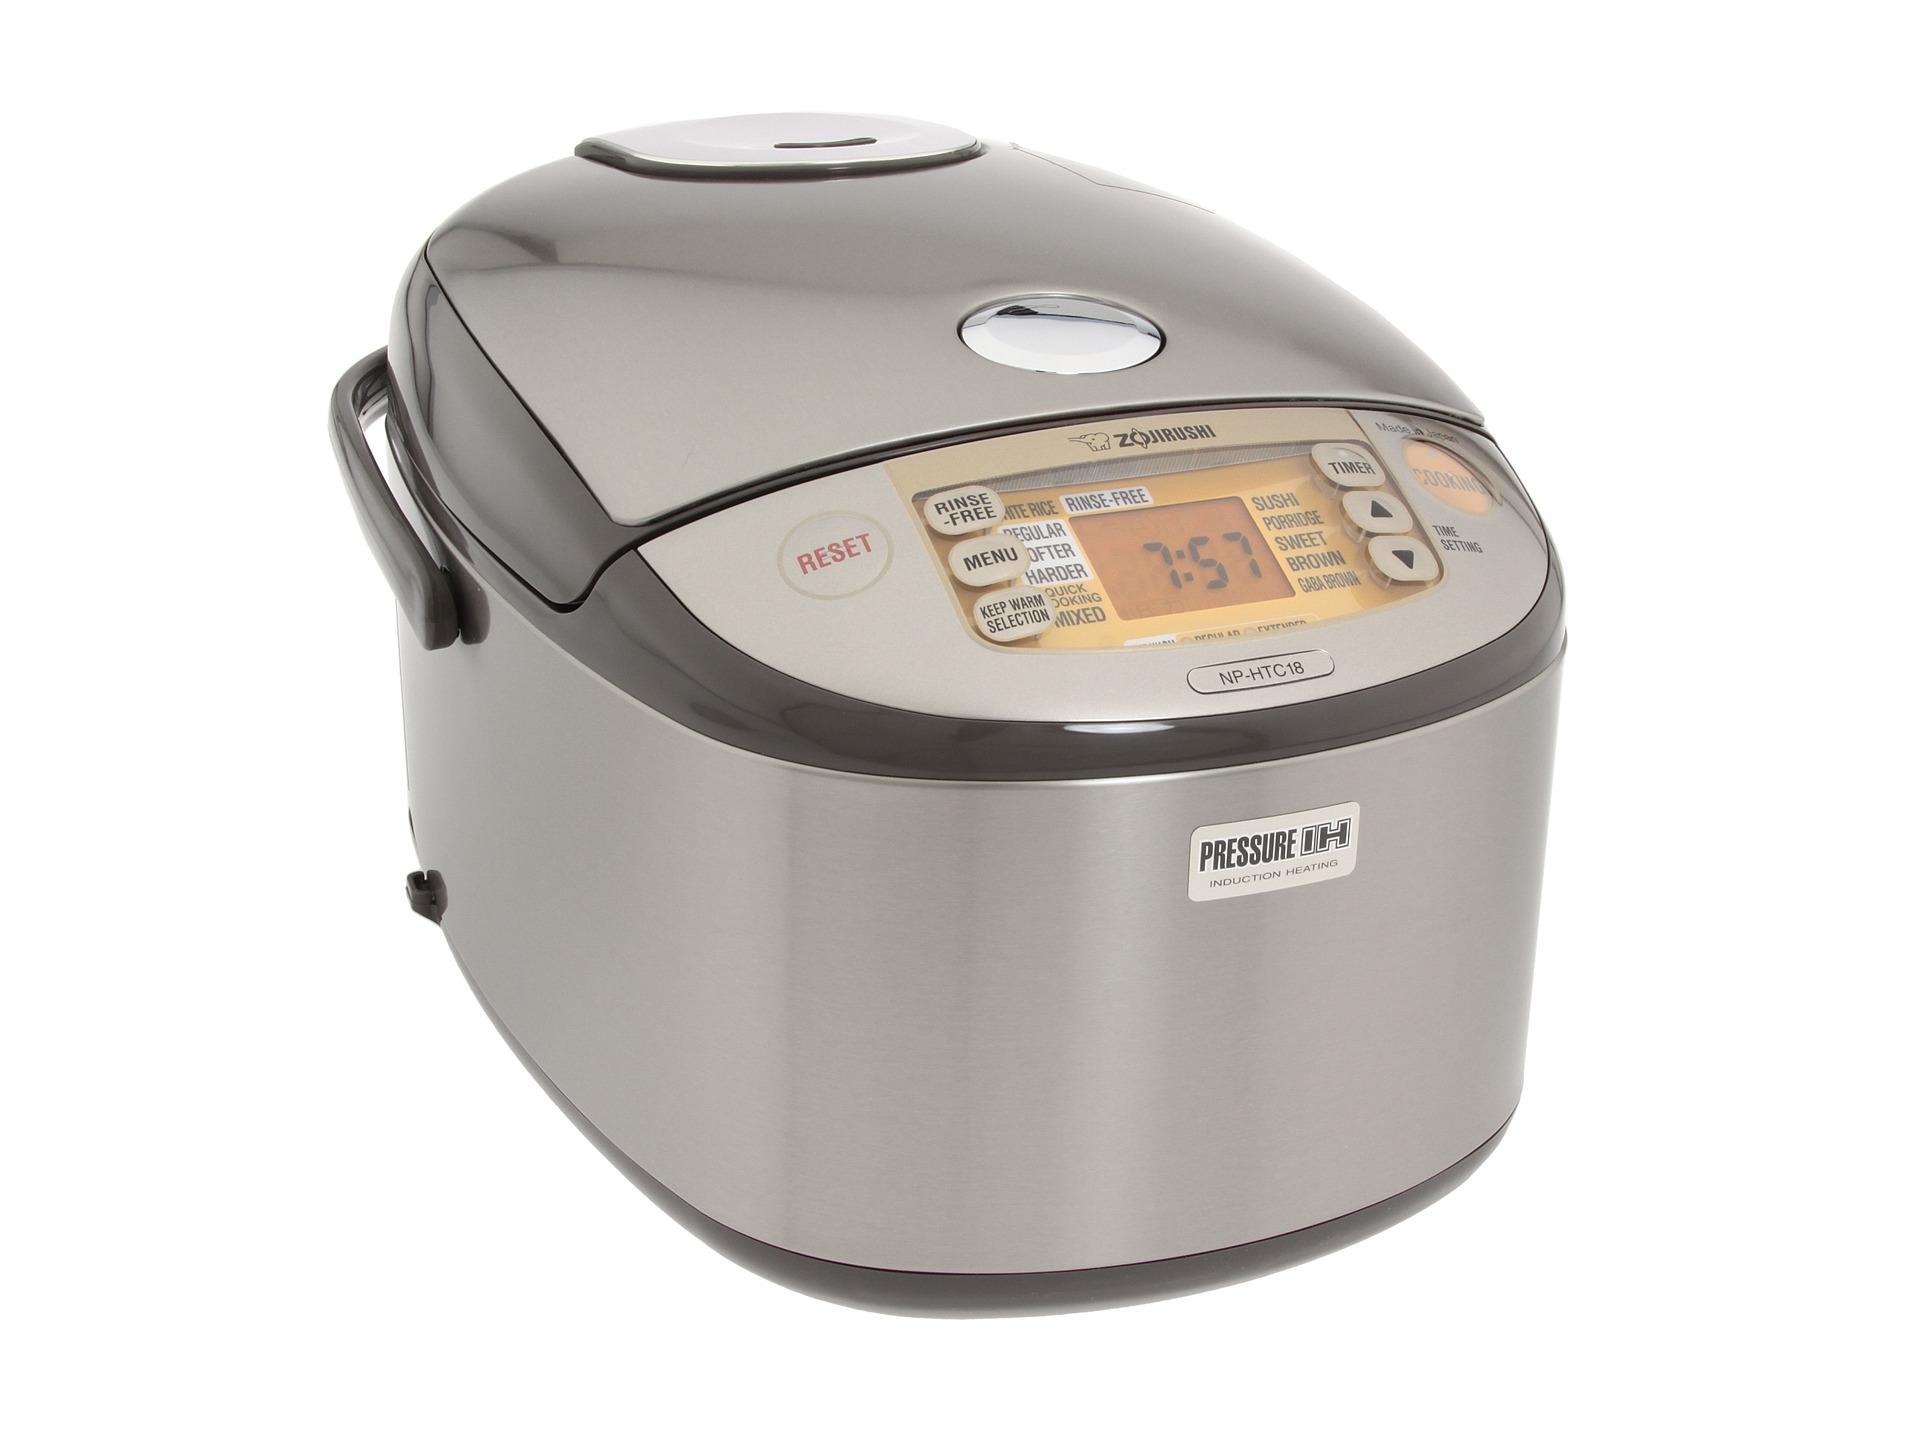 Zojirushi Induction Heating Rice Cooker Zojirushi NP HTC18XJ Induction Heating Pressure 10 Cup ...